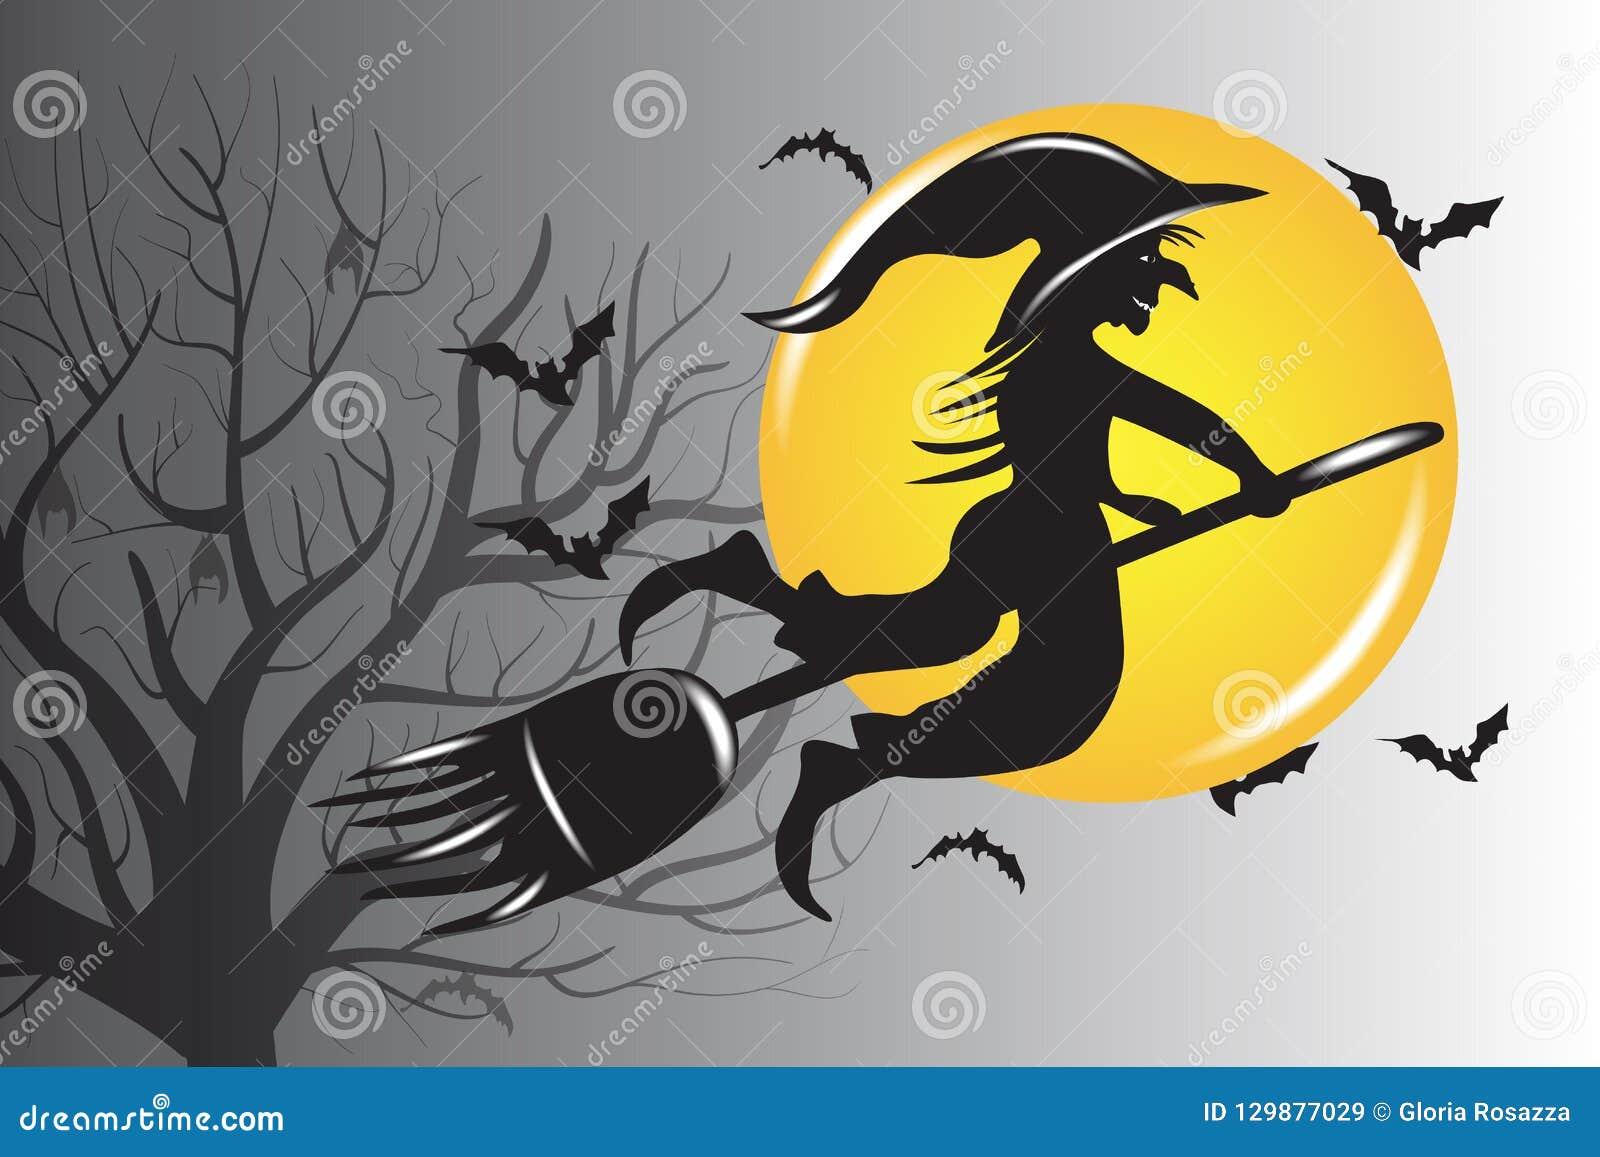 Halloween-Hexen-Schattenbild-Vektor-Entwurf